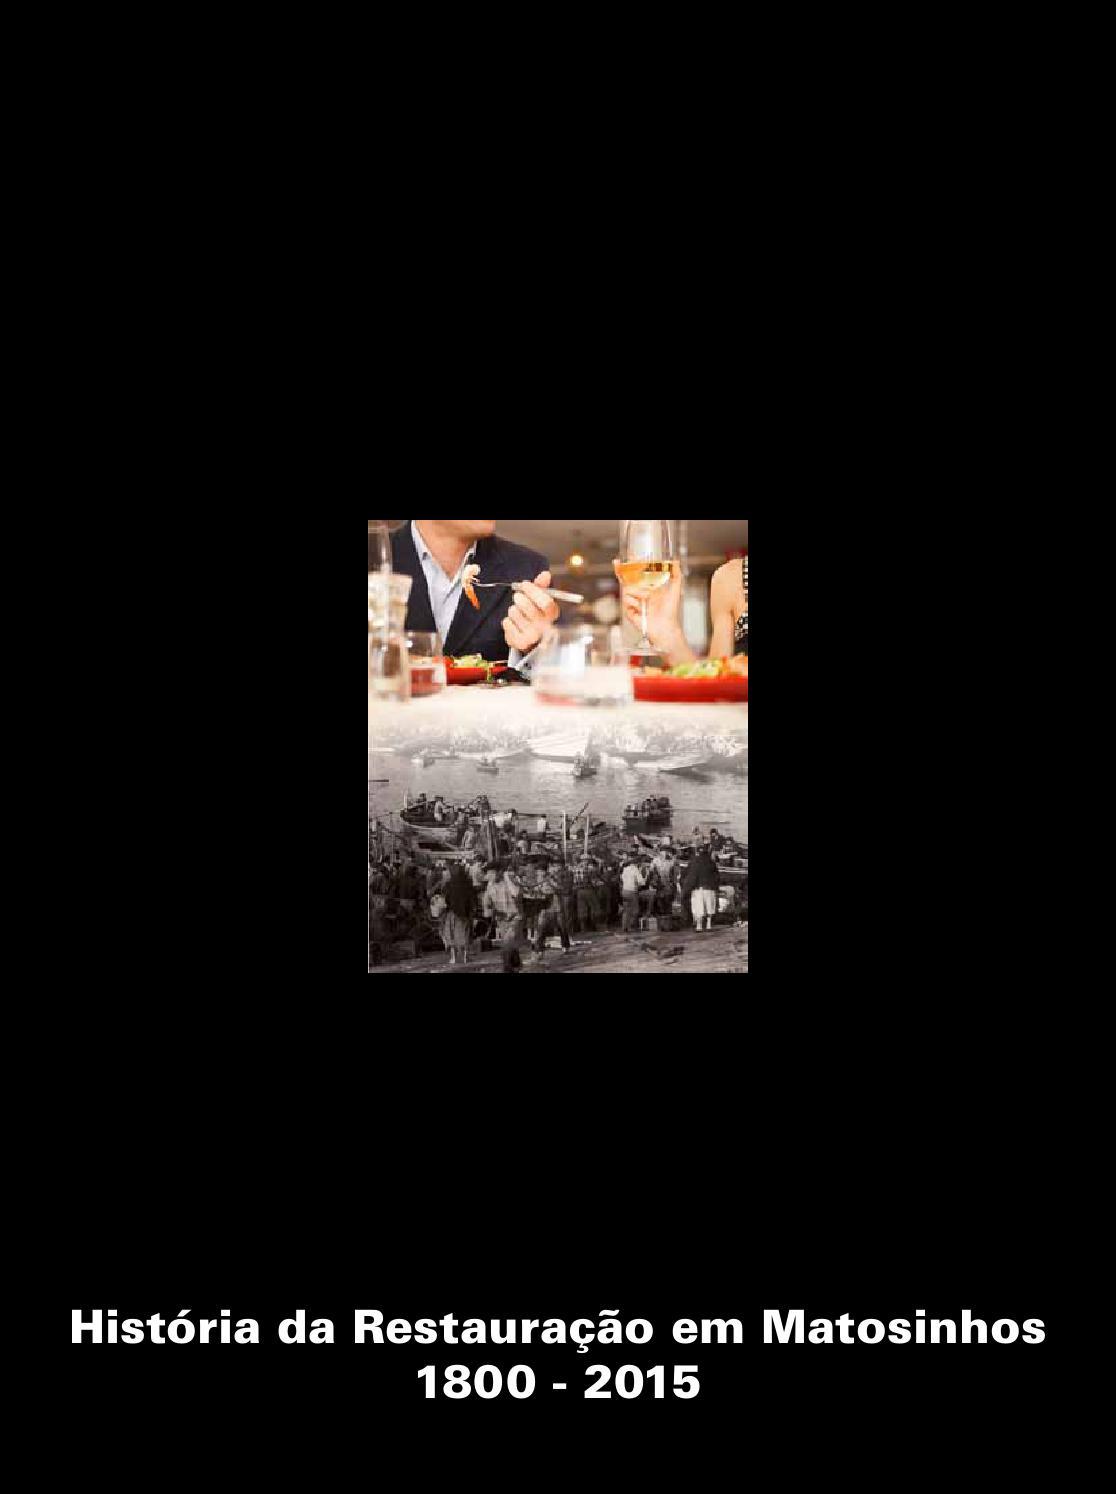 Casa do mar aquario vasco de gama 1898 1998 carlos caseiro estar - Casa Do Mar Aquario Vasco De Gama 1898 1998 Carlos Caseiro Estar 29